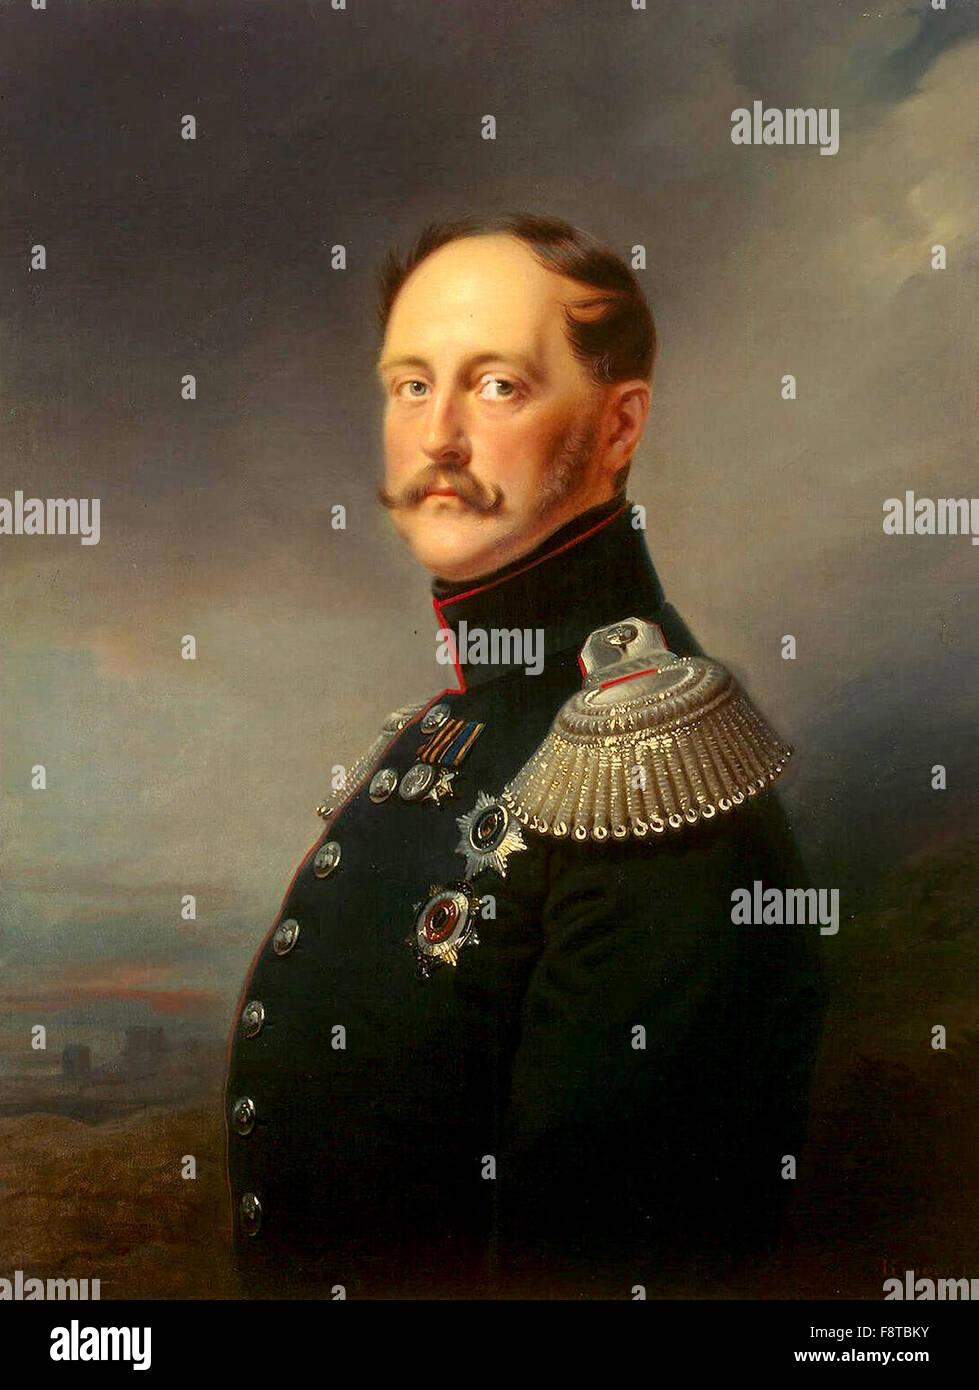 Emperor Nicholas I, Emperor of Russia from 1825 until 1855 - Stock Image